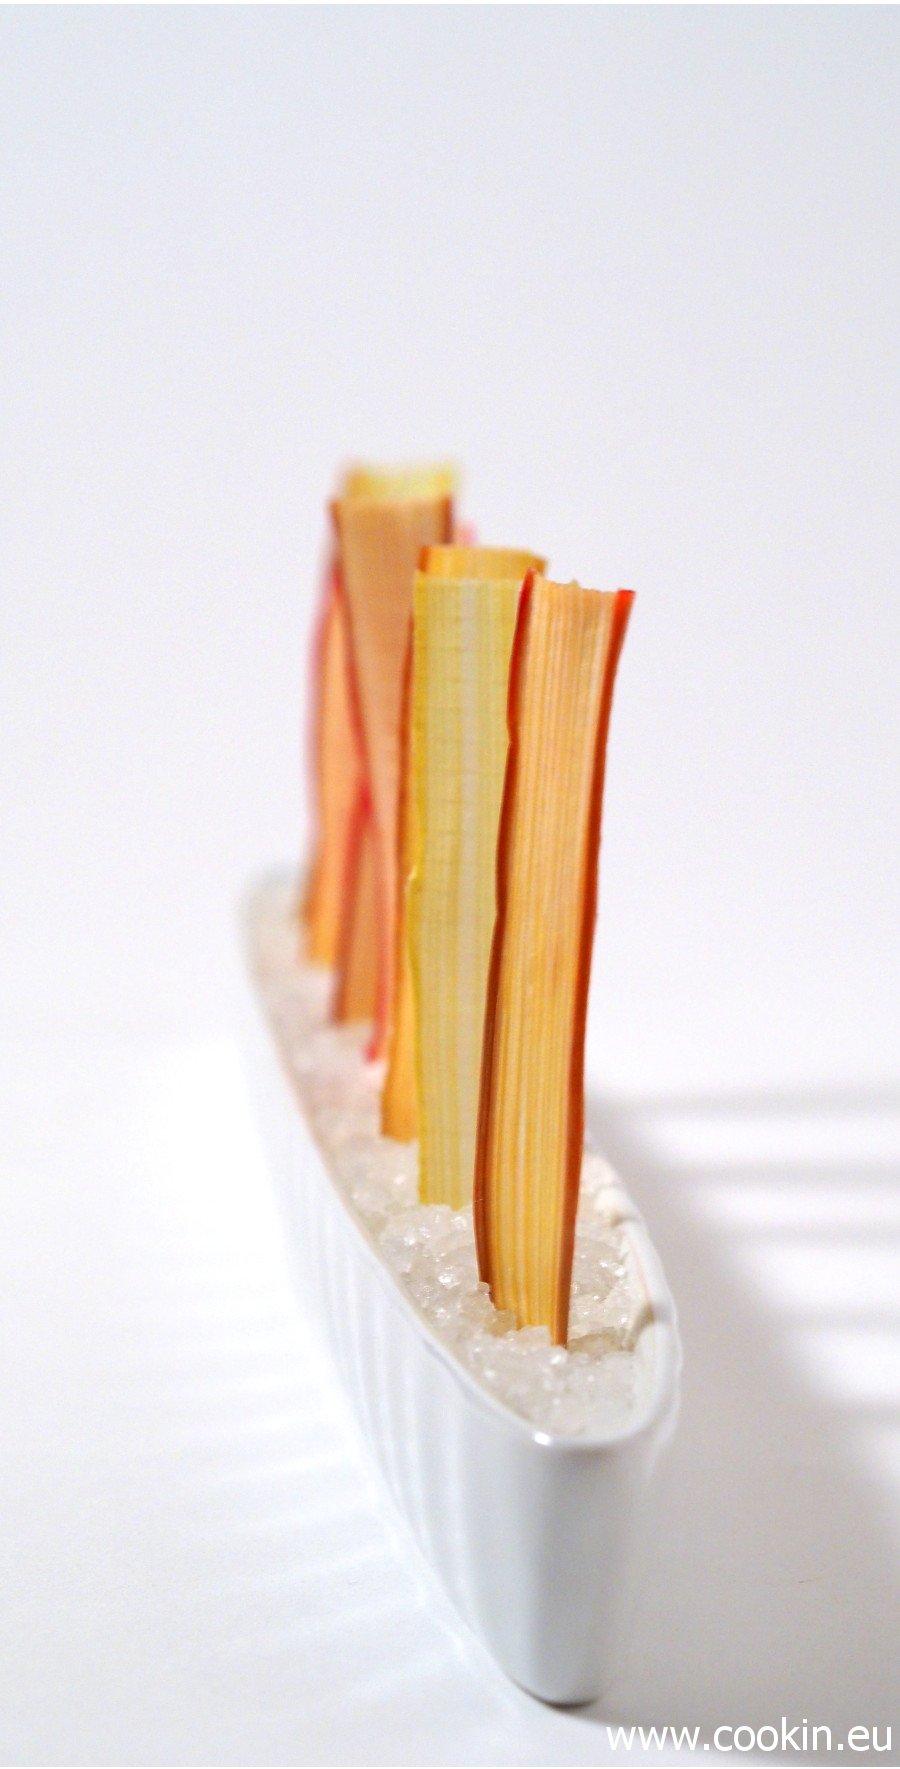 rhabarber-chips-2-hk-900